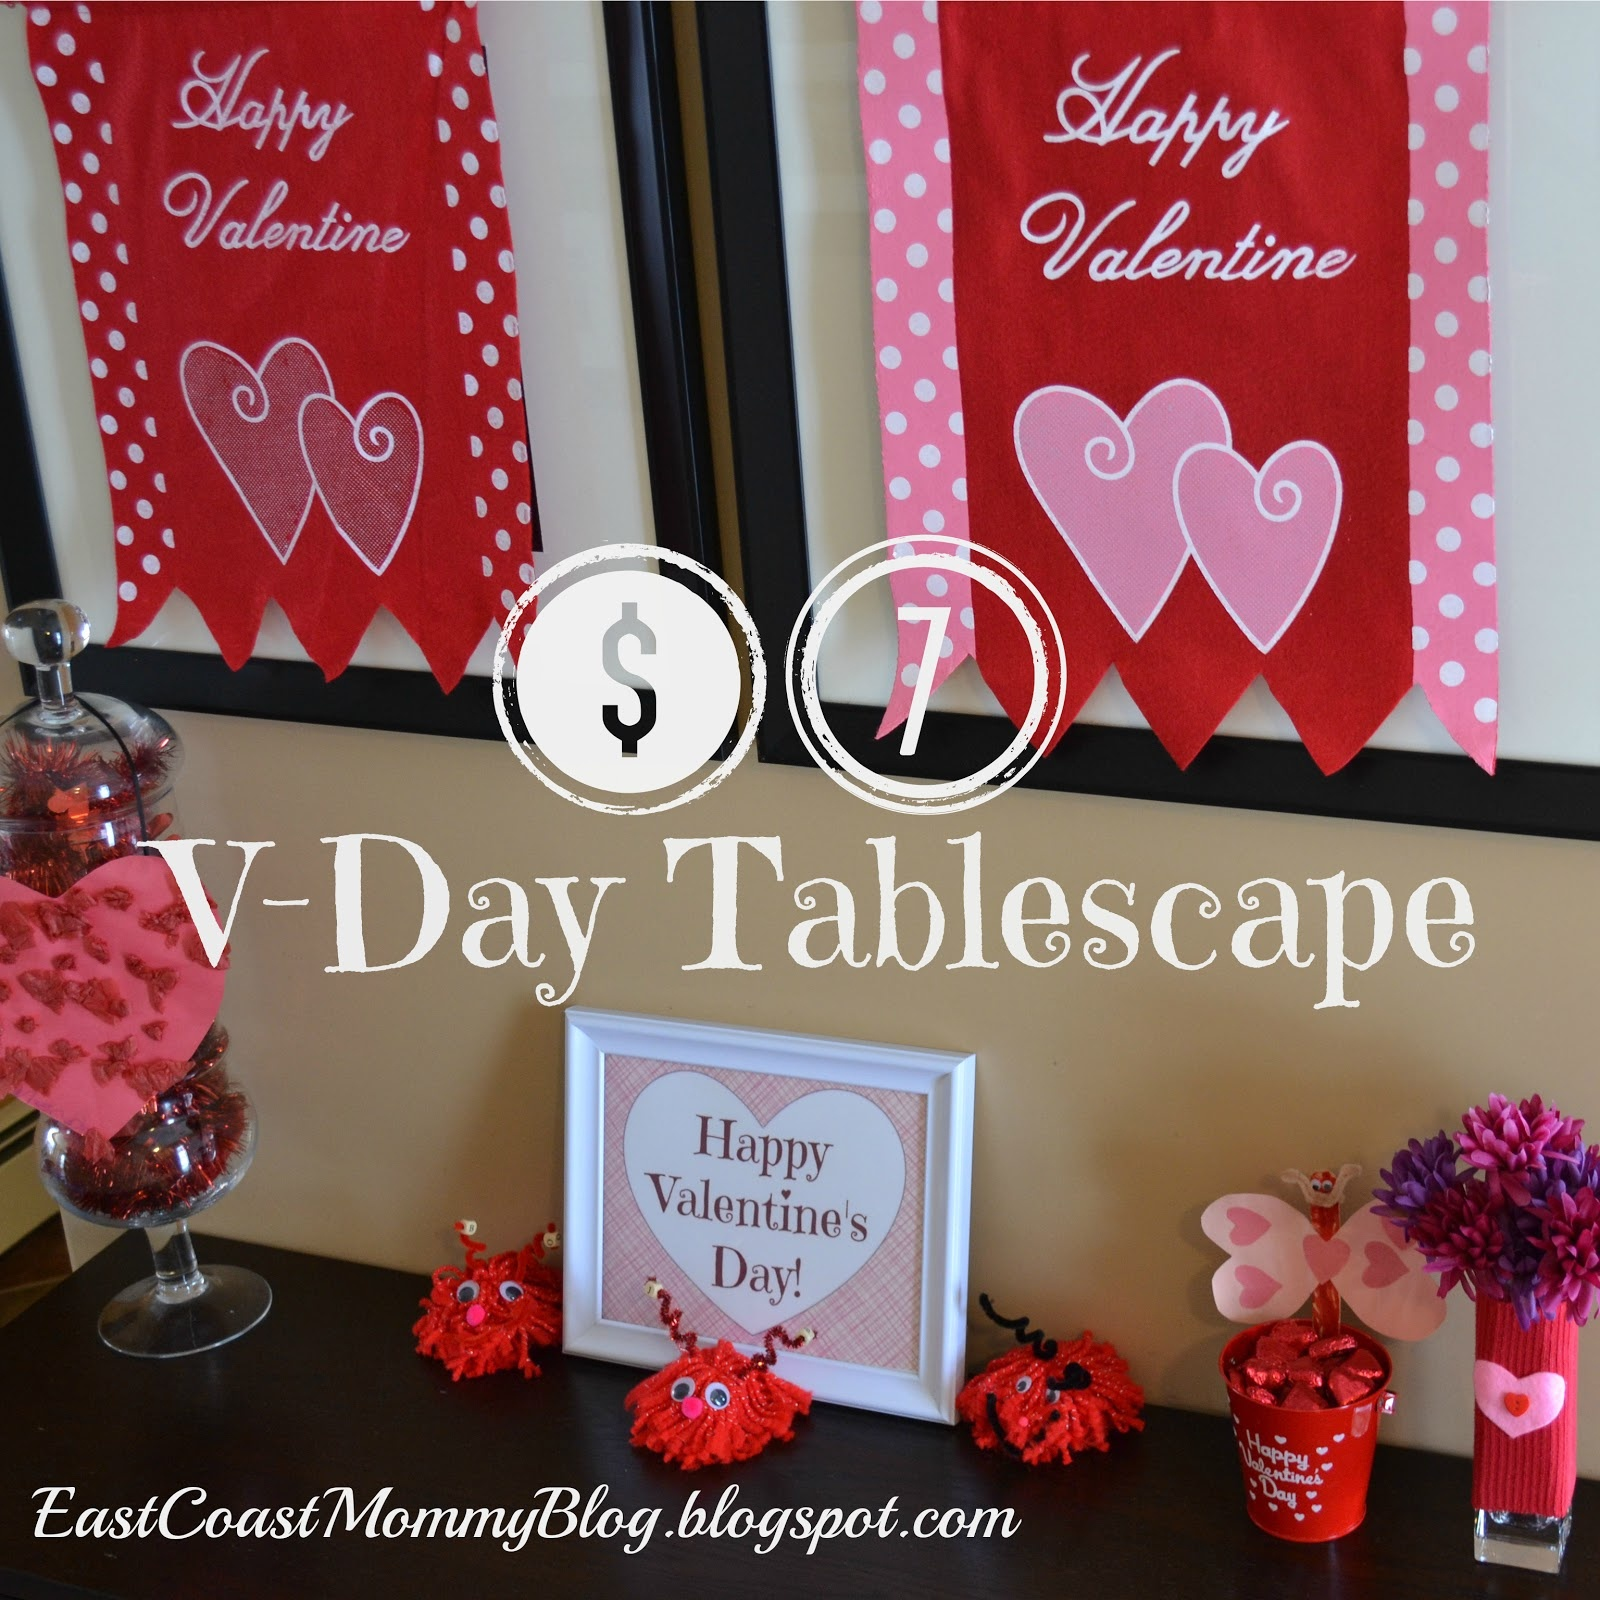 East Coast Mommy: Diy Valentine's Day Decor {With Free Printable} - Free Printable Valentine's Day Decorations